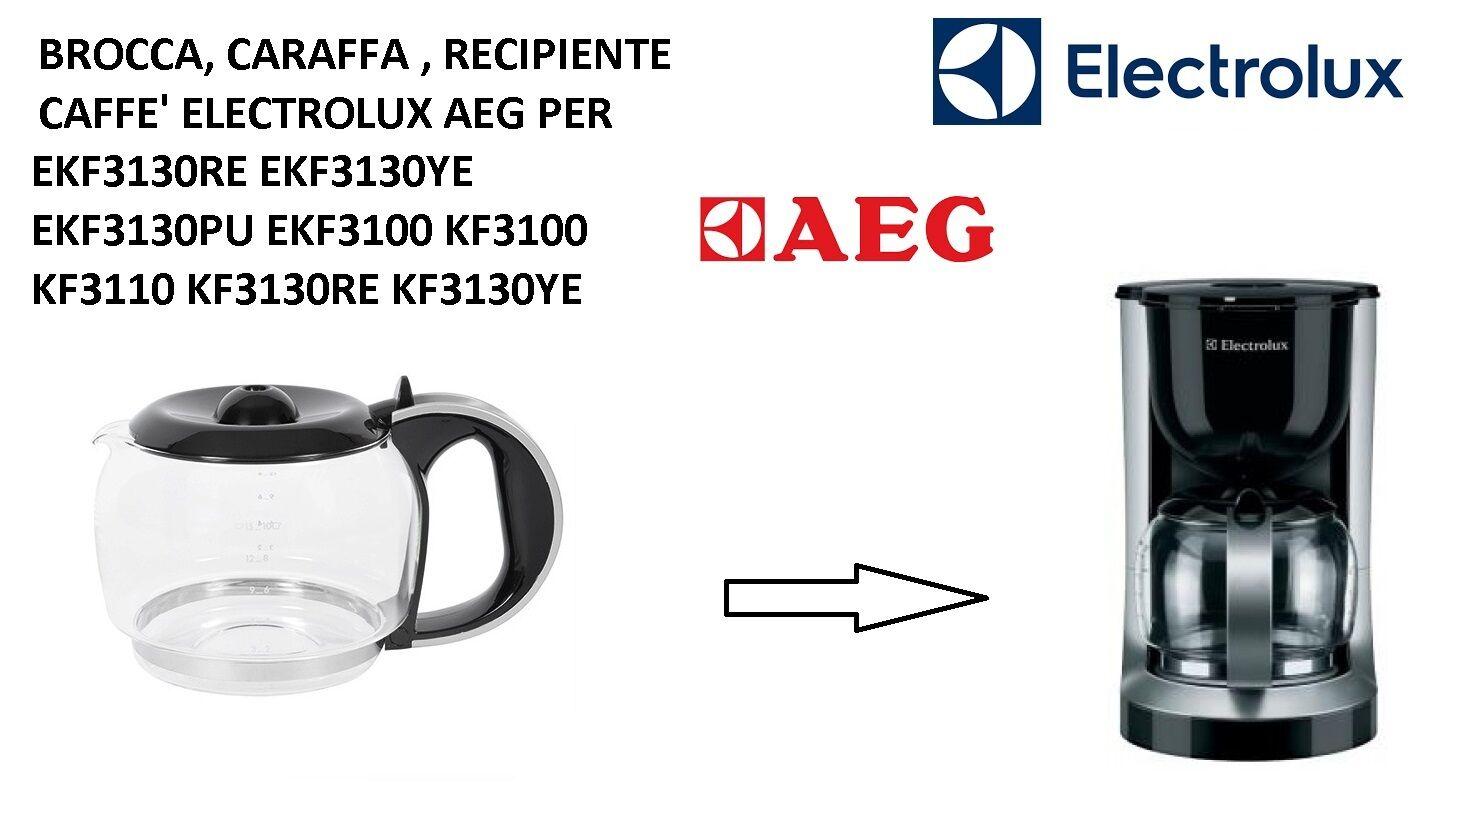 BROCCA CARAFFA SEBATOIO CAFFETTIERE ELECTROLUX AEG ORIGINALE EKF3130PU EKF3100